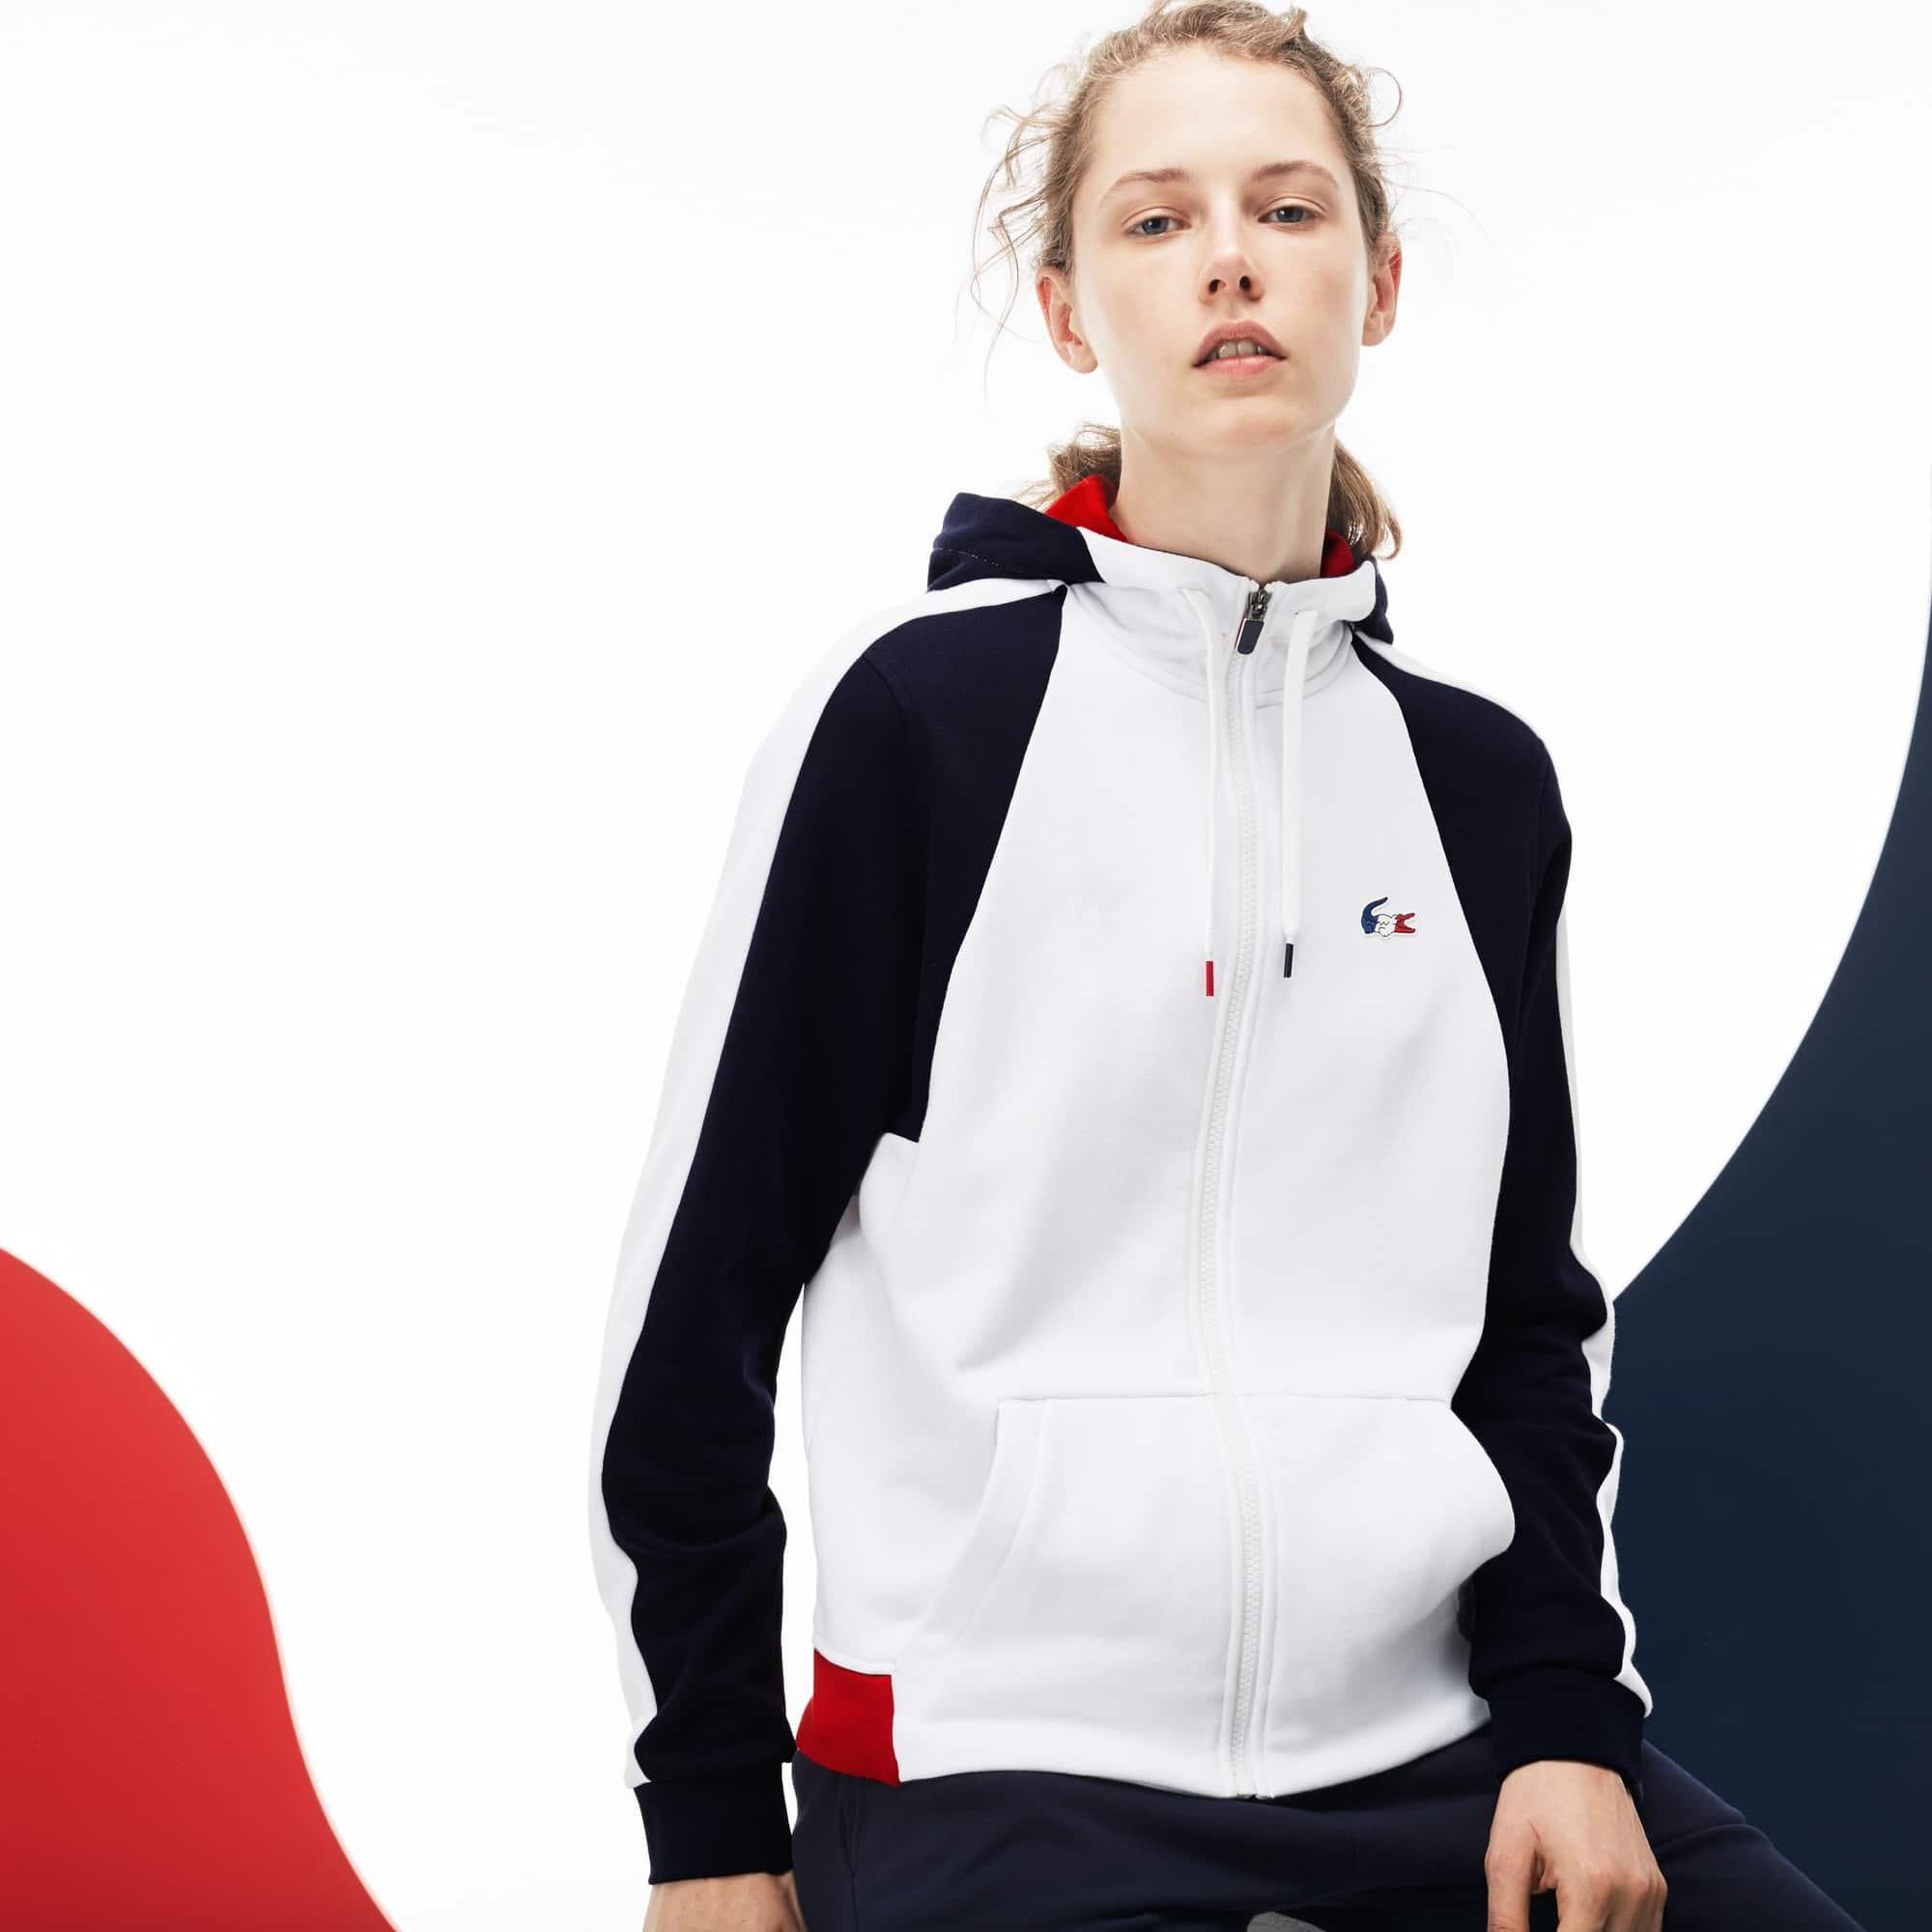 Women's French Sporting Spirit Edition Colorblock Fleece Sweatshirt